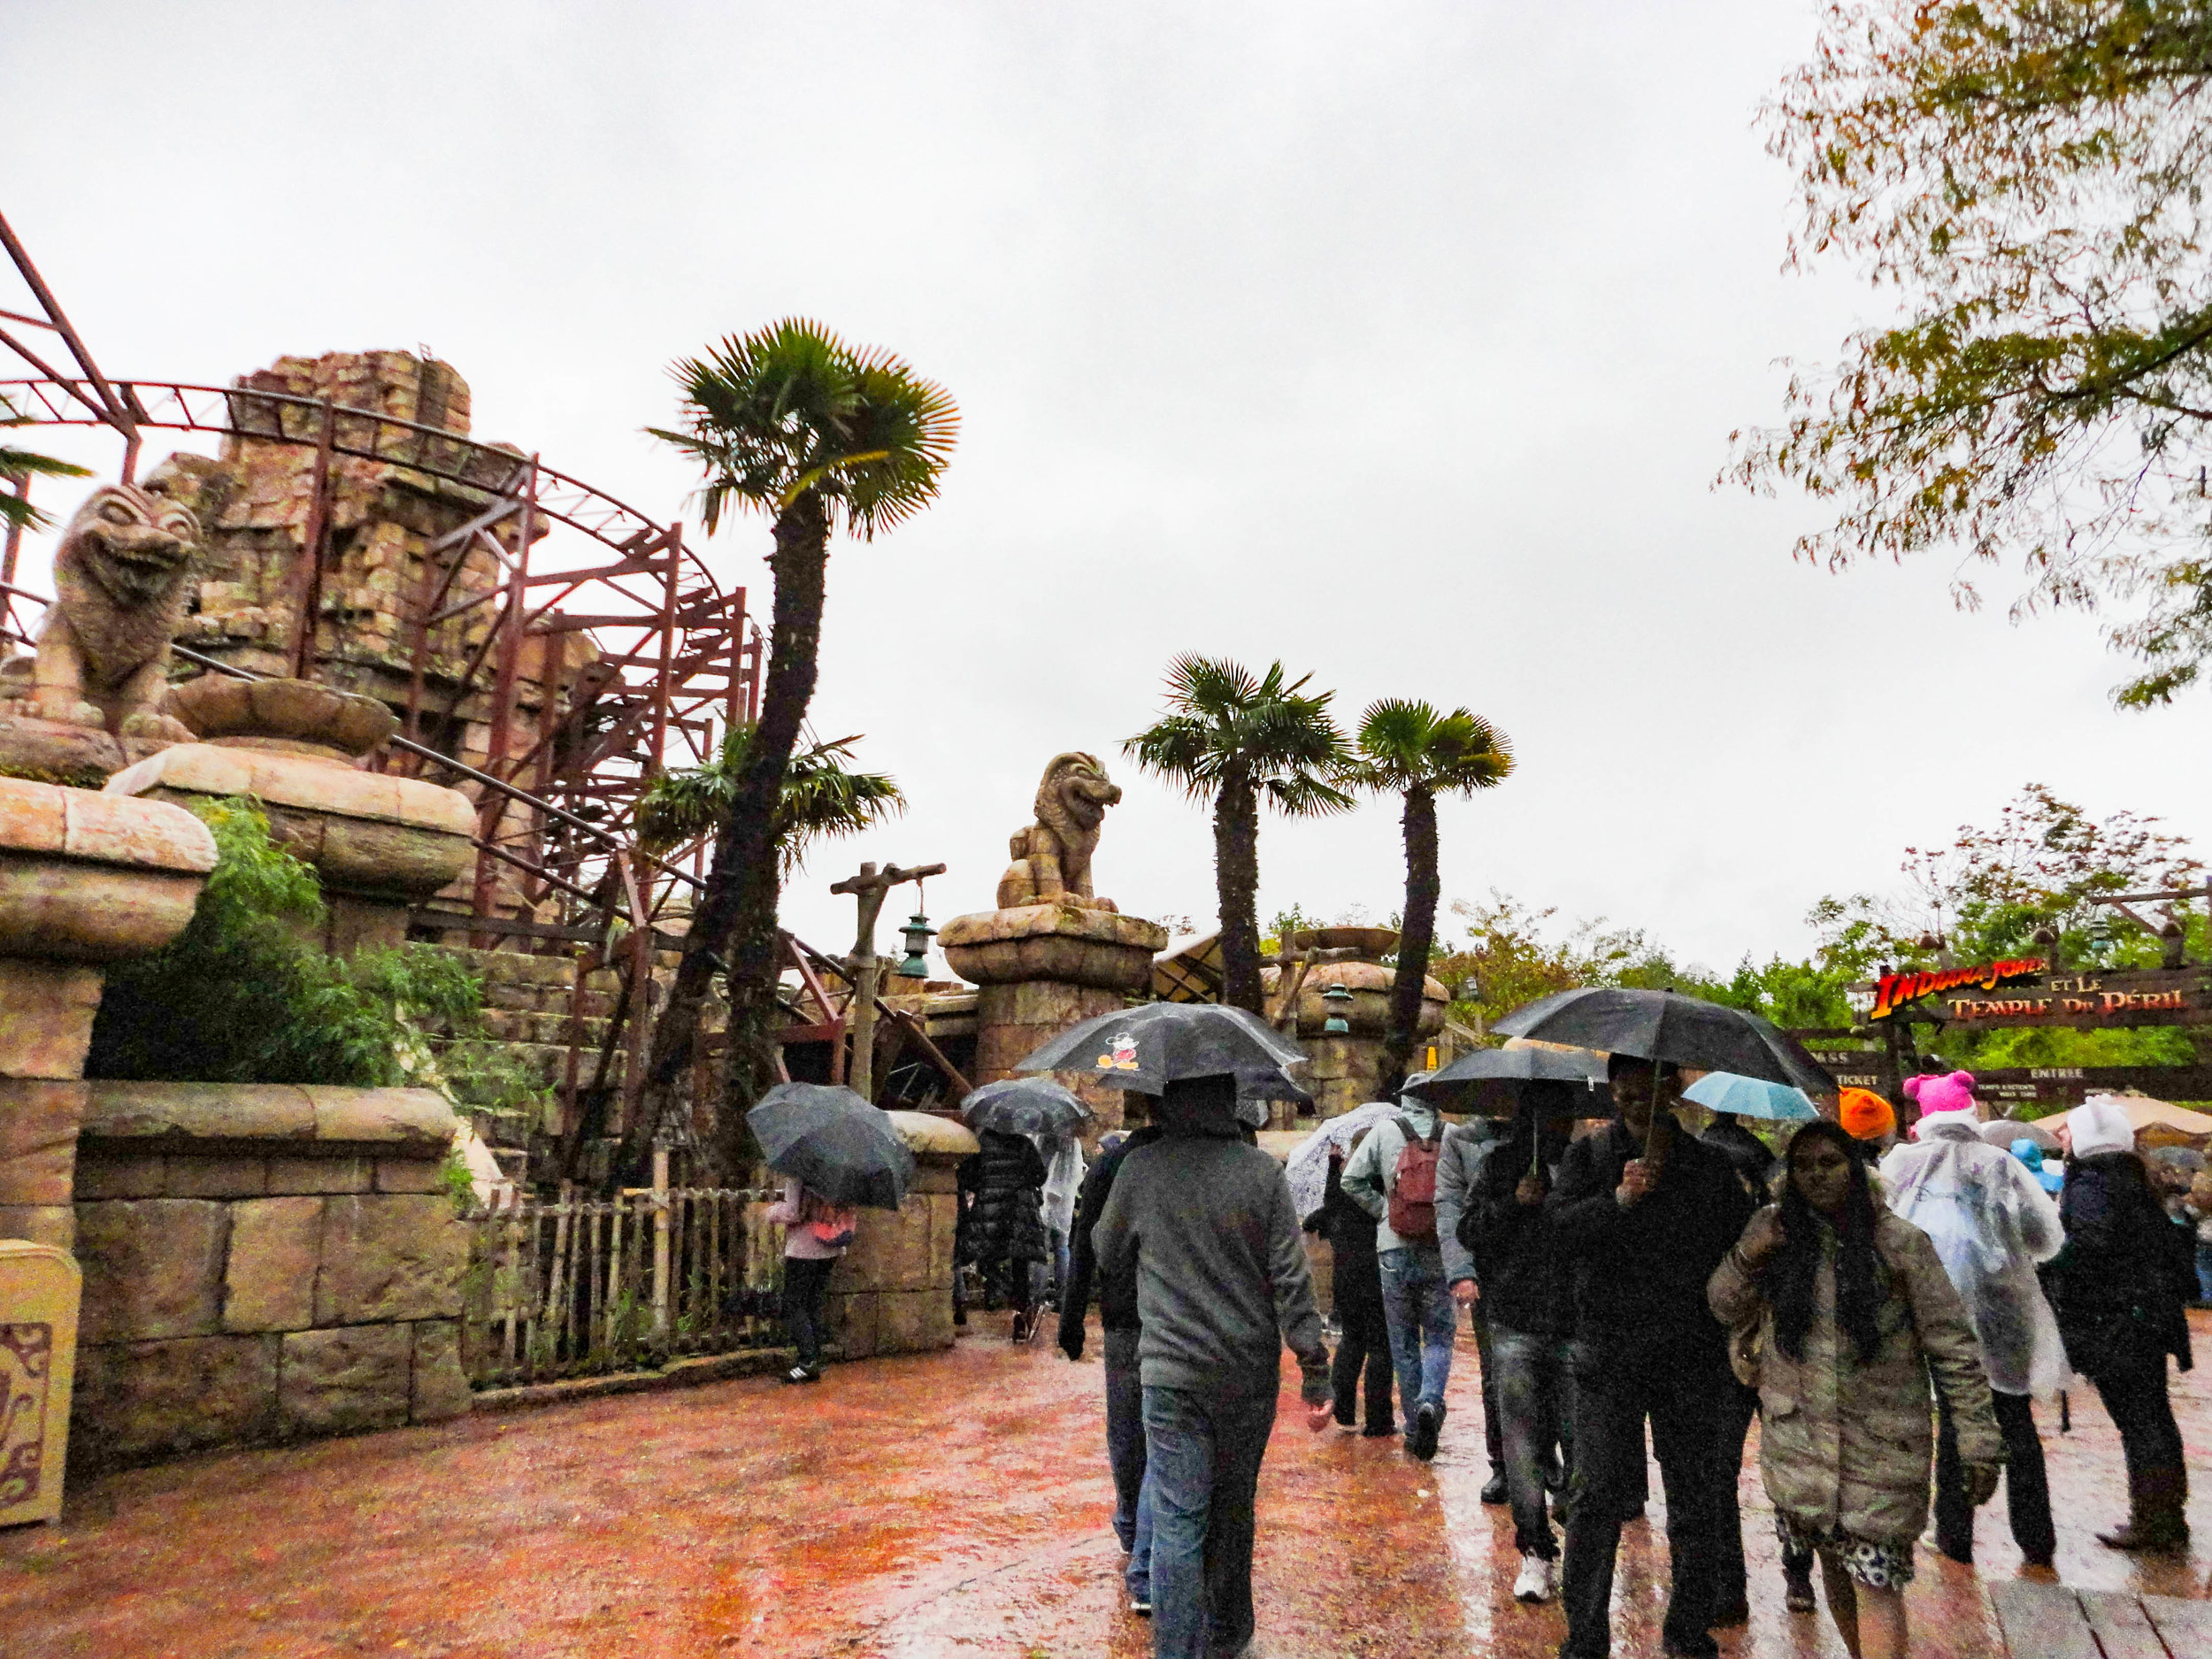 Paris Disneyland-INDIANA JONES ET LETEMPLE DU PÉRIL.jpg